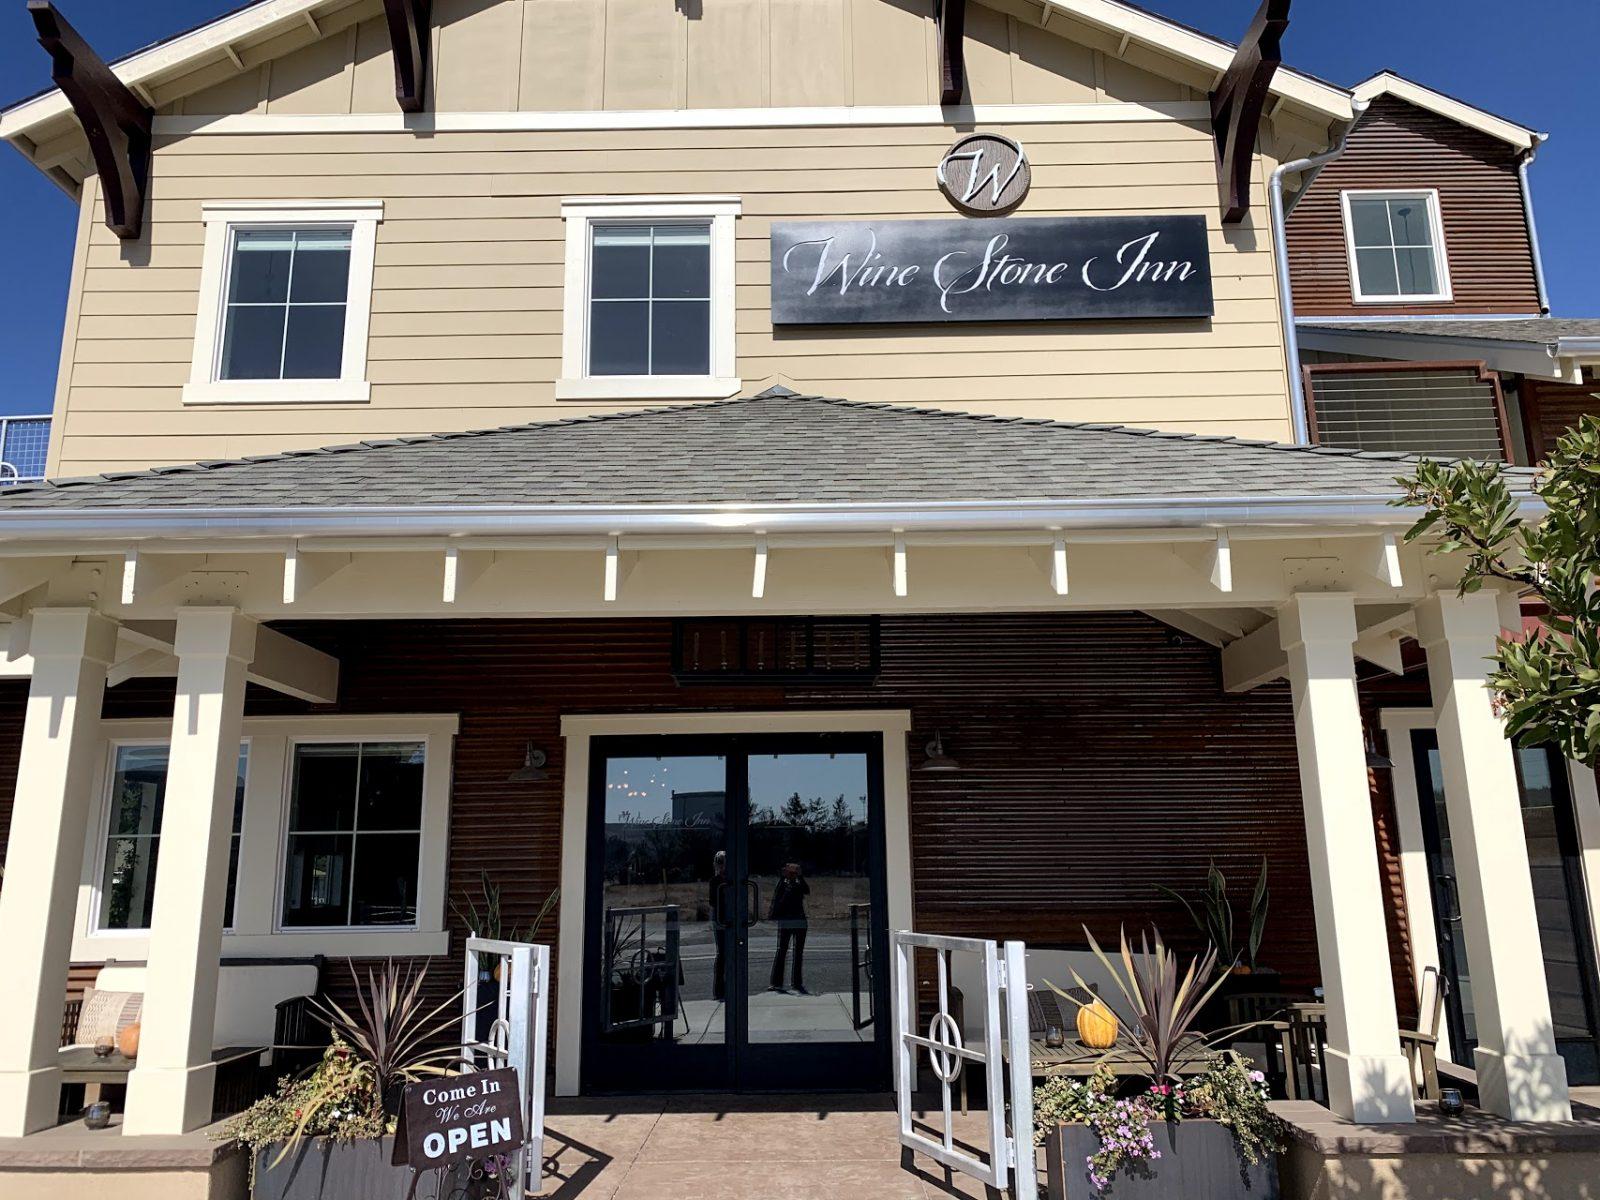 Wine Stone Inn